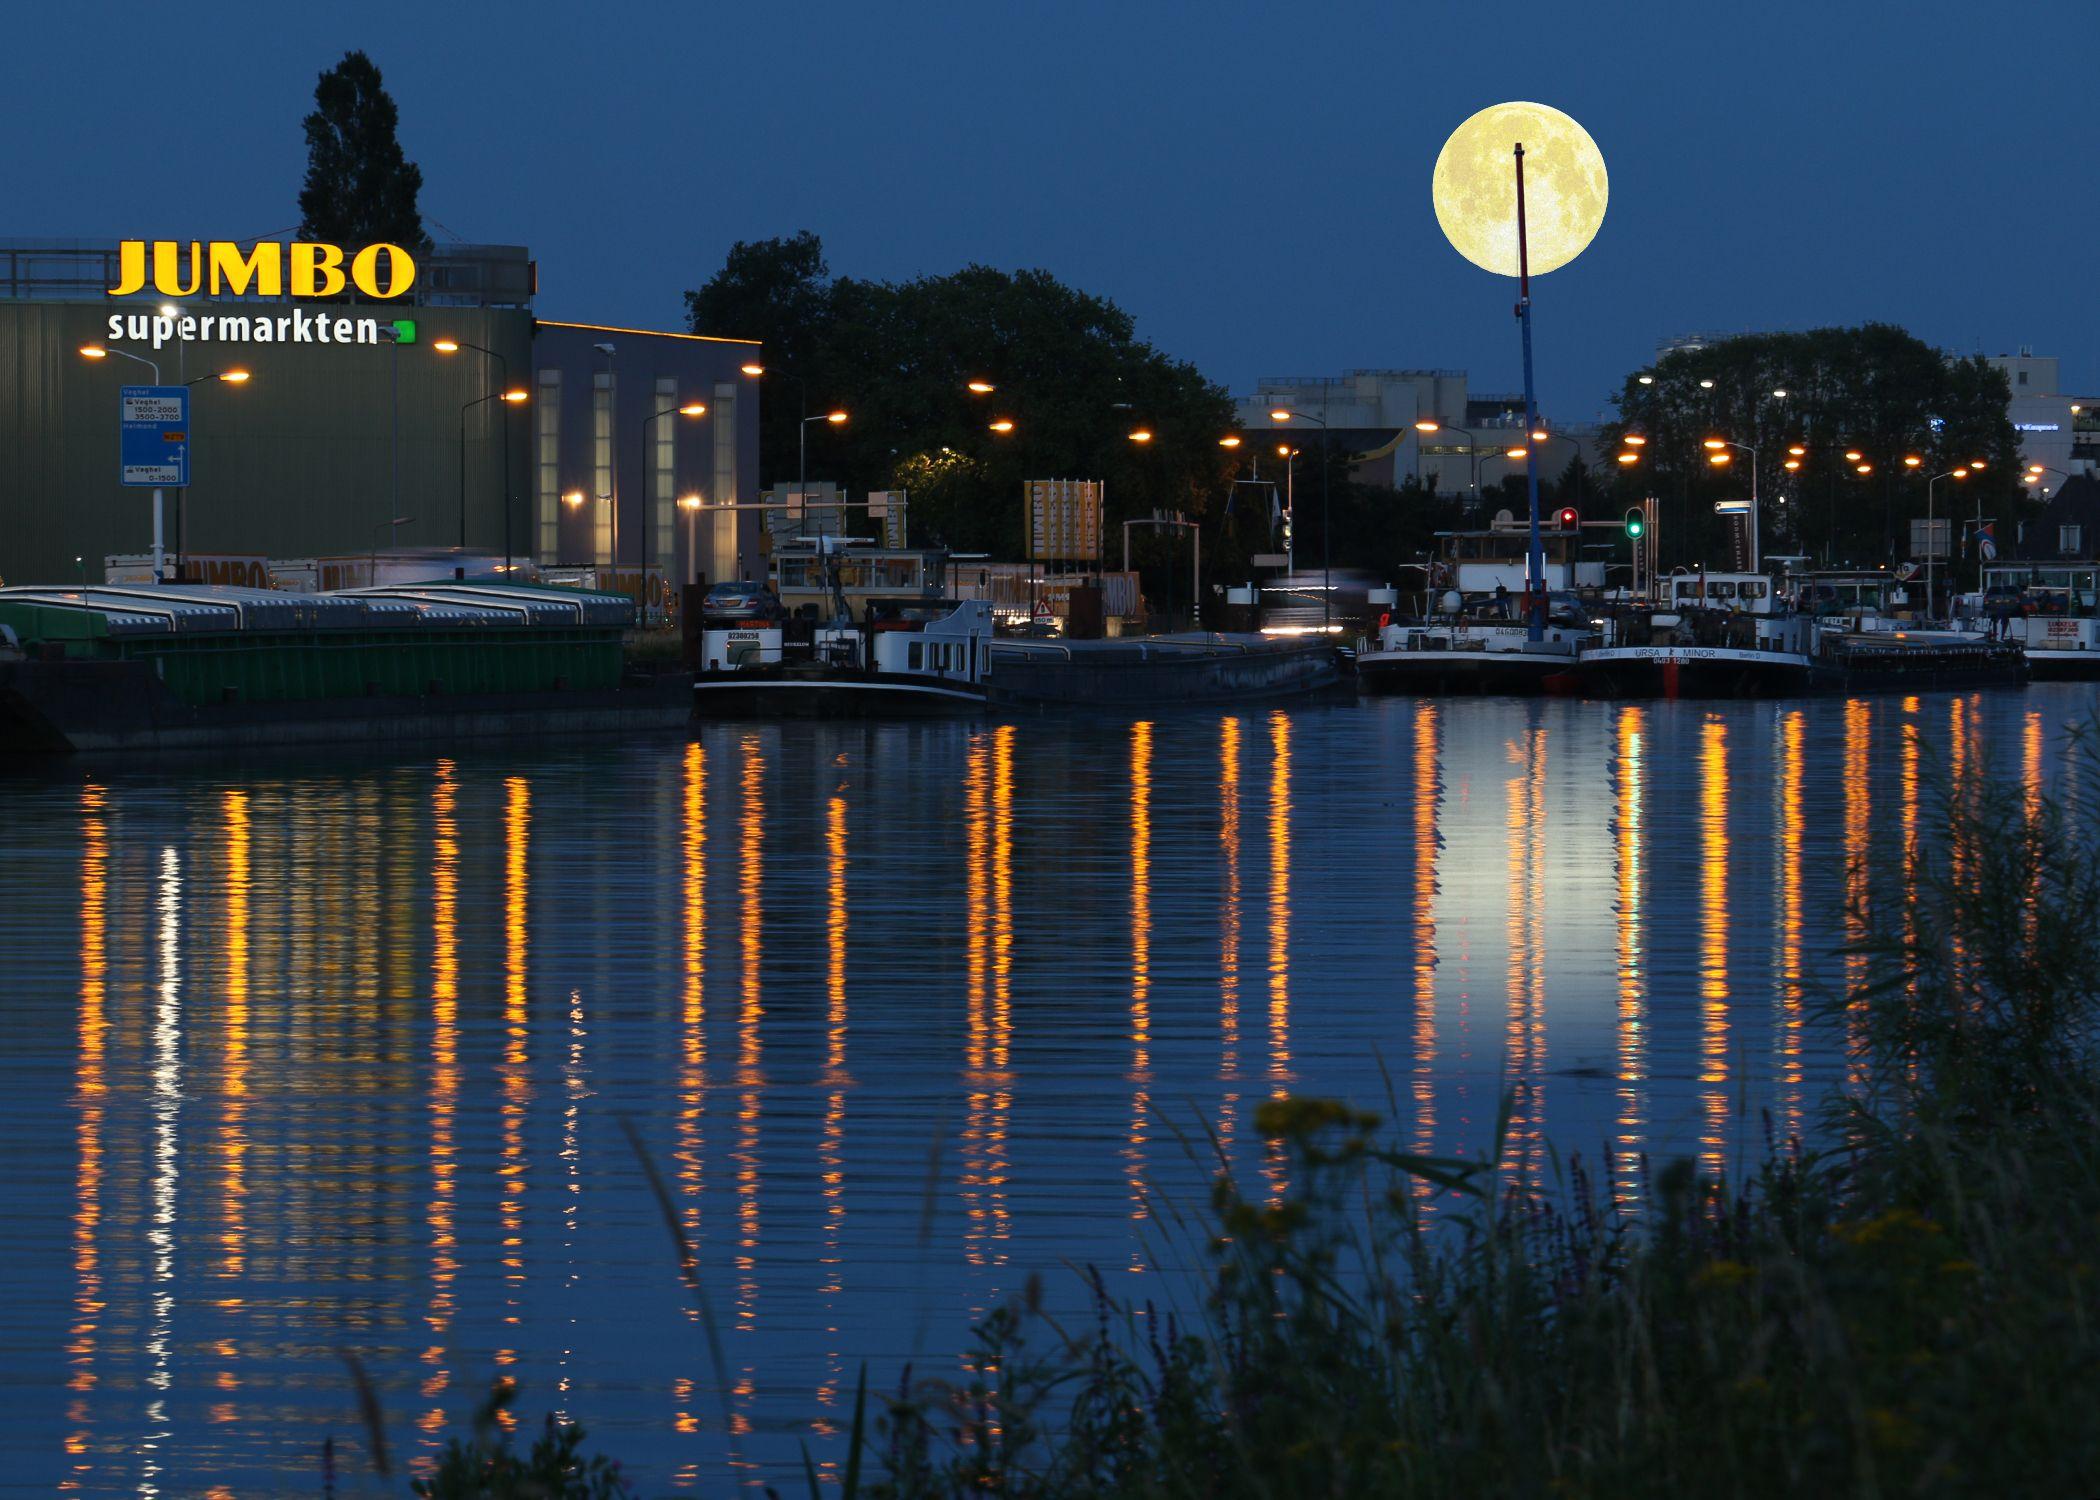 Jumbo supermarket company in Veghel and a beautiful moonrise.